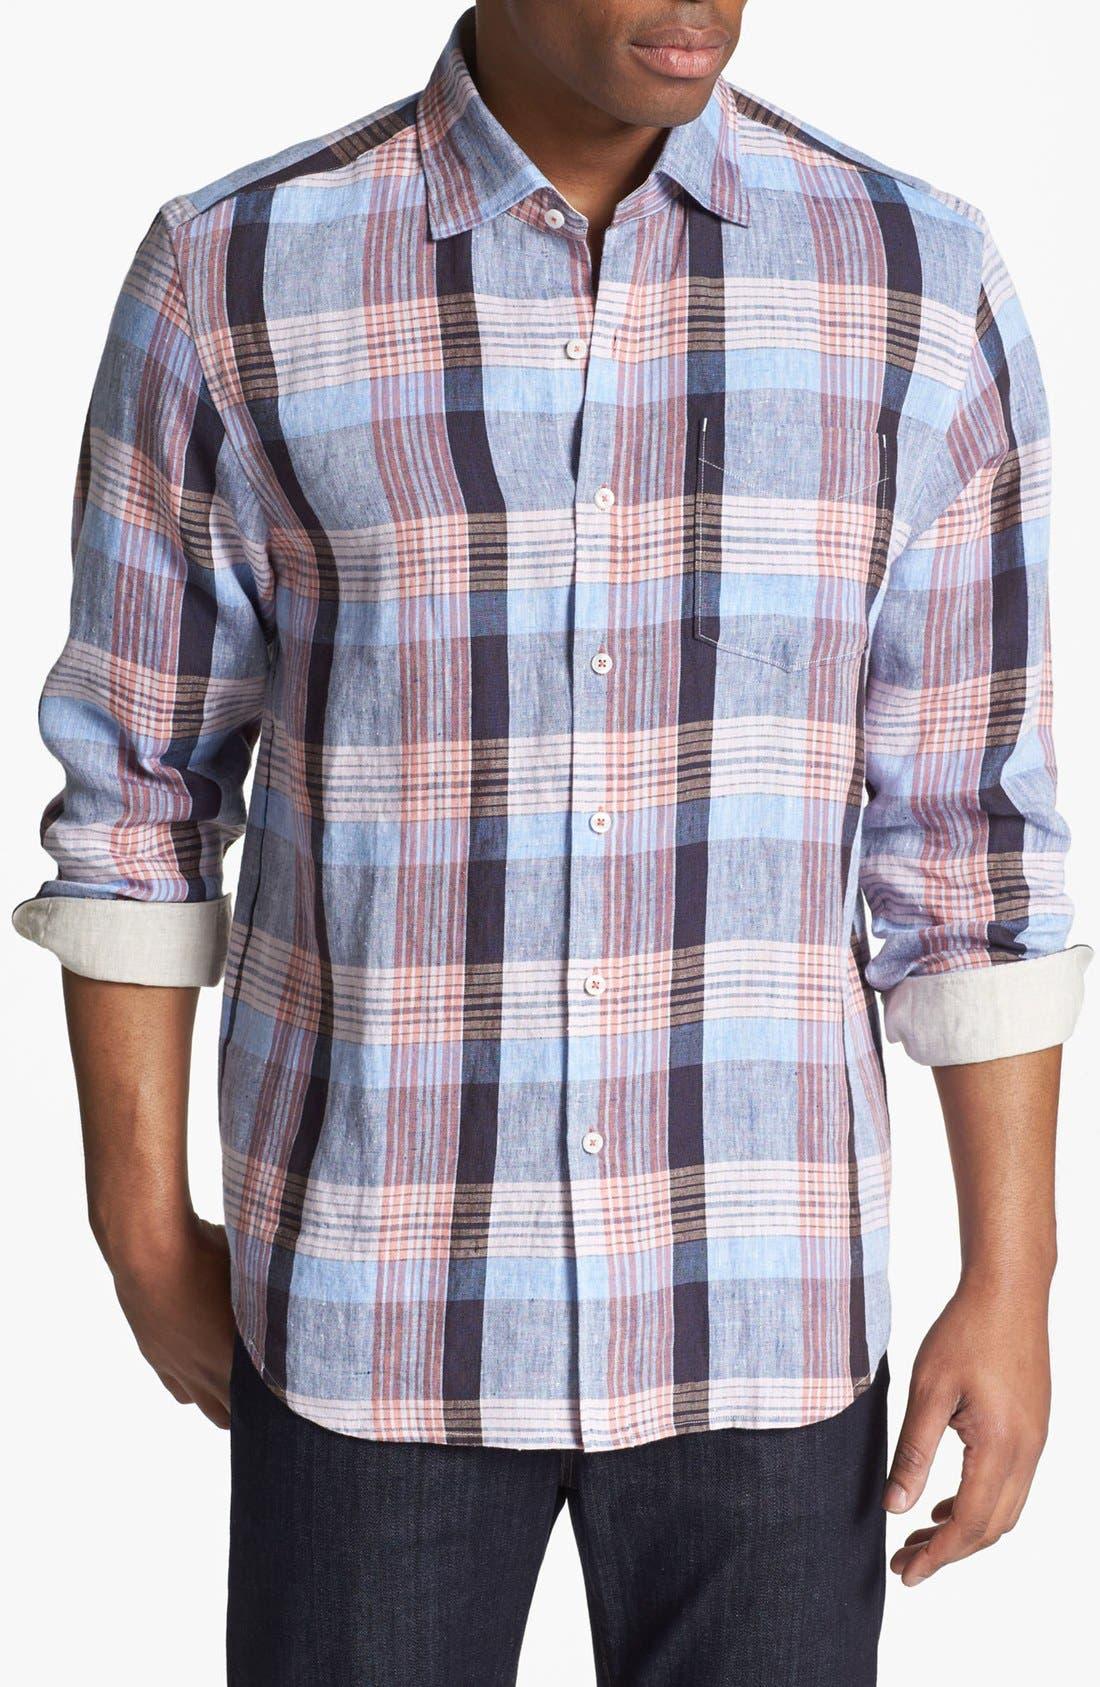 Main Image - Tommy Bahama 'Grande' Regular Fit Linen Sport Shirt